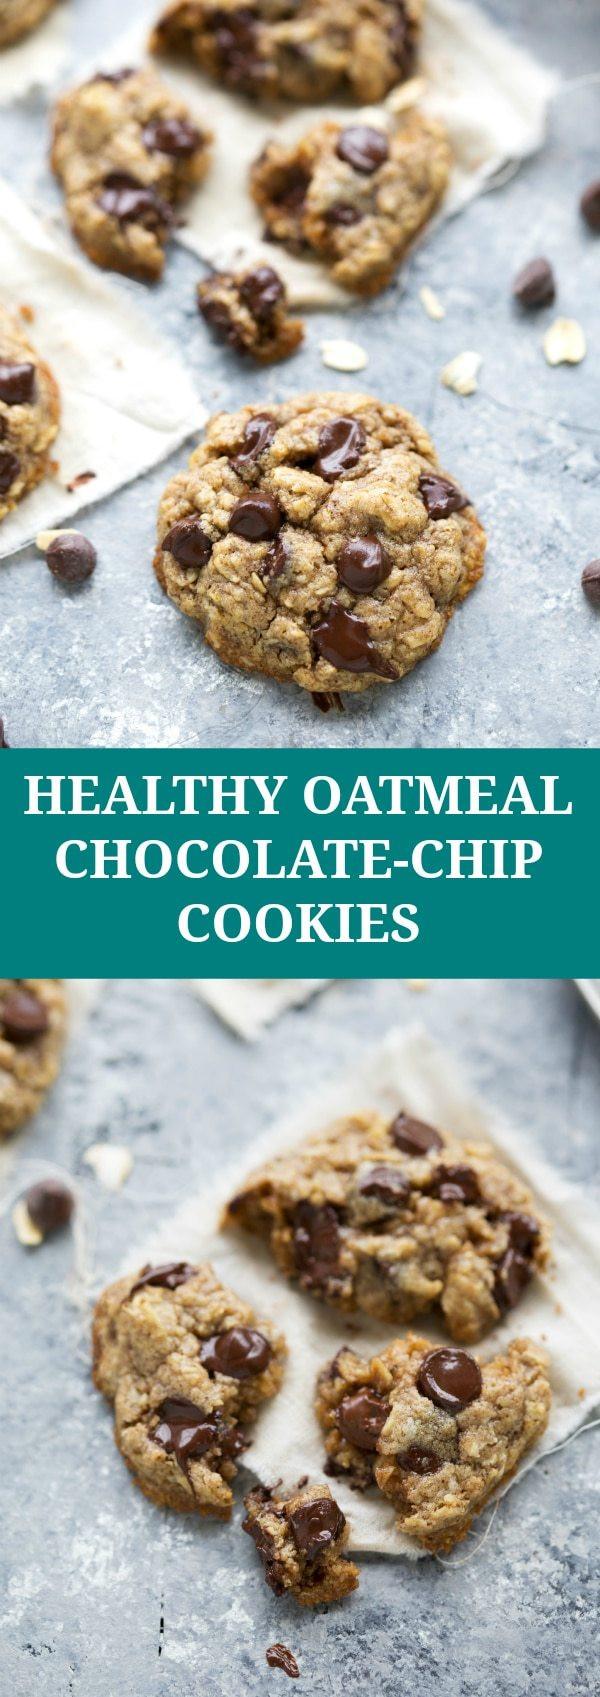 Healthy Oatmeal Chocolate Chip Cookies No butter the Best the Best Healthy Oatmeal Chocolate Chip Cookies Chelsea